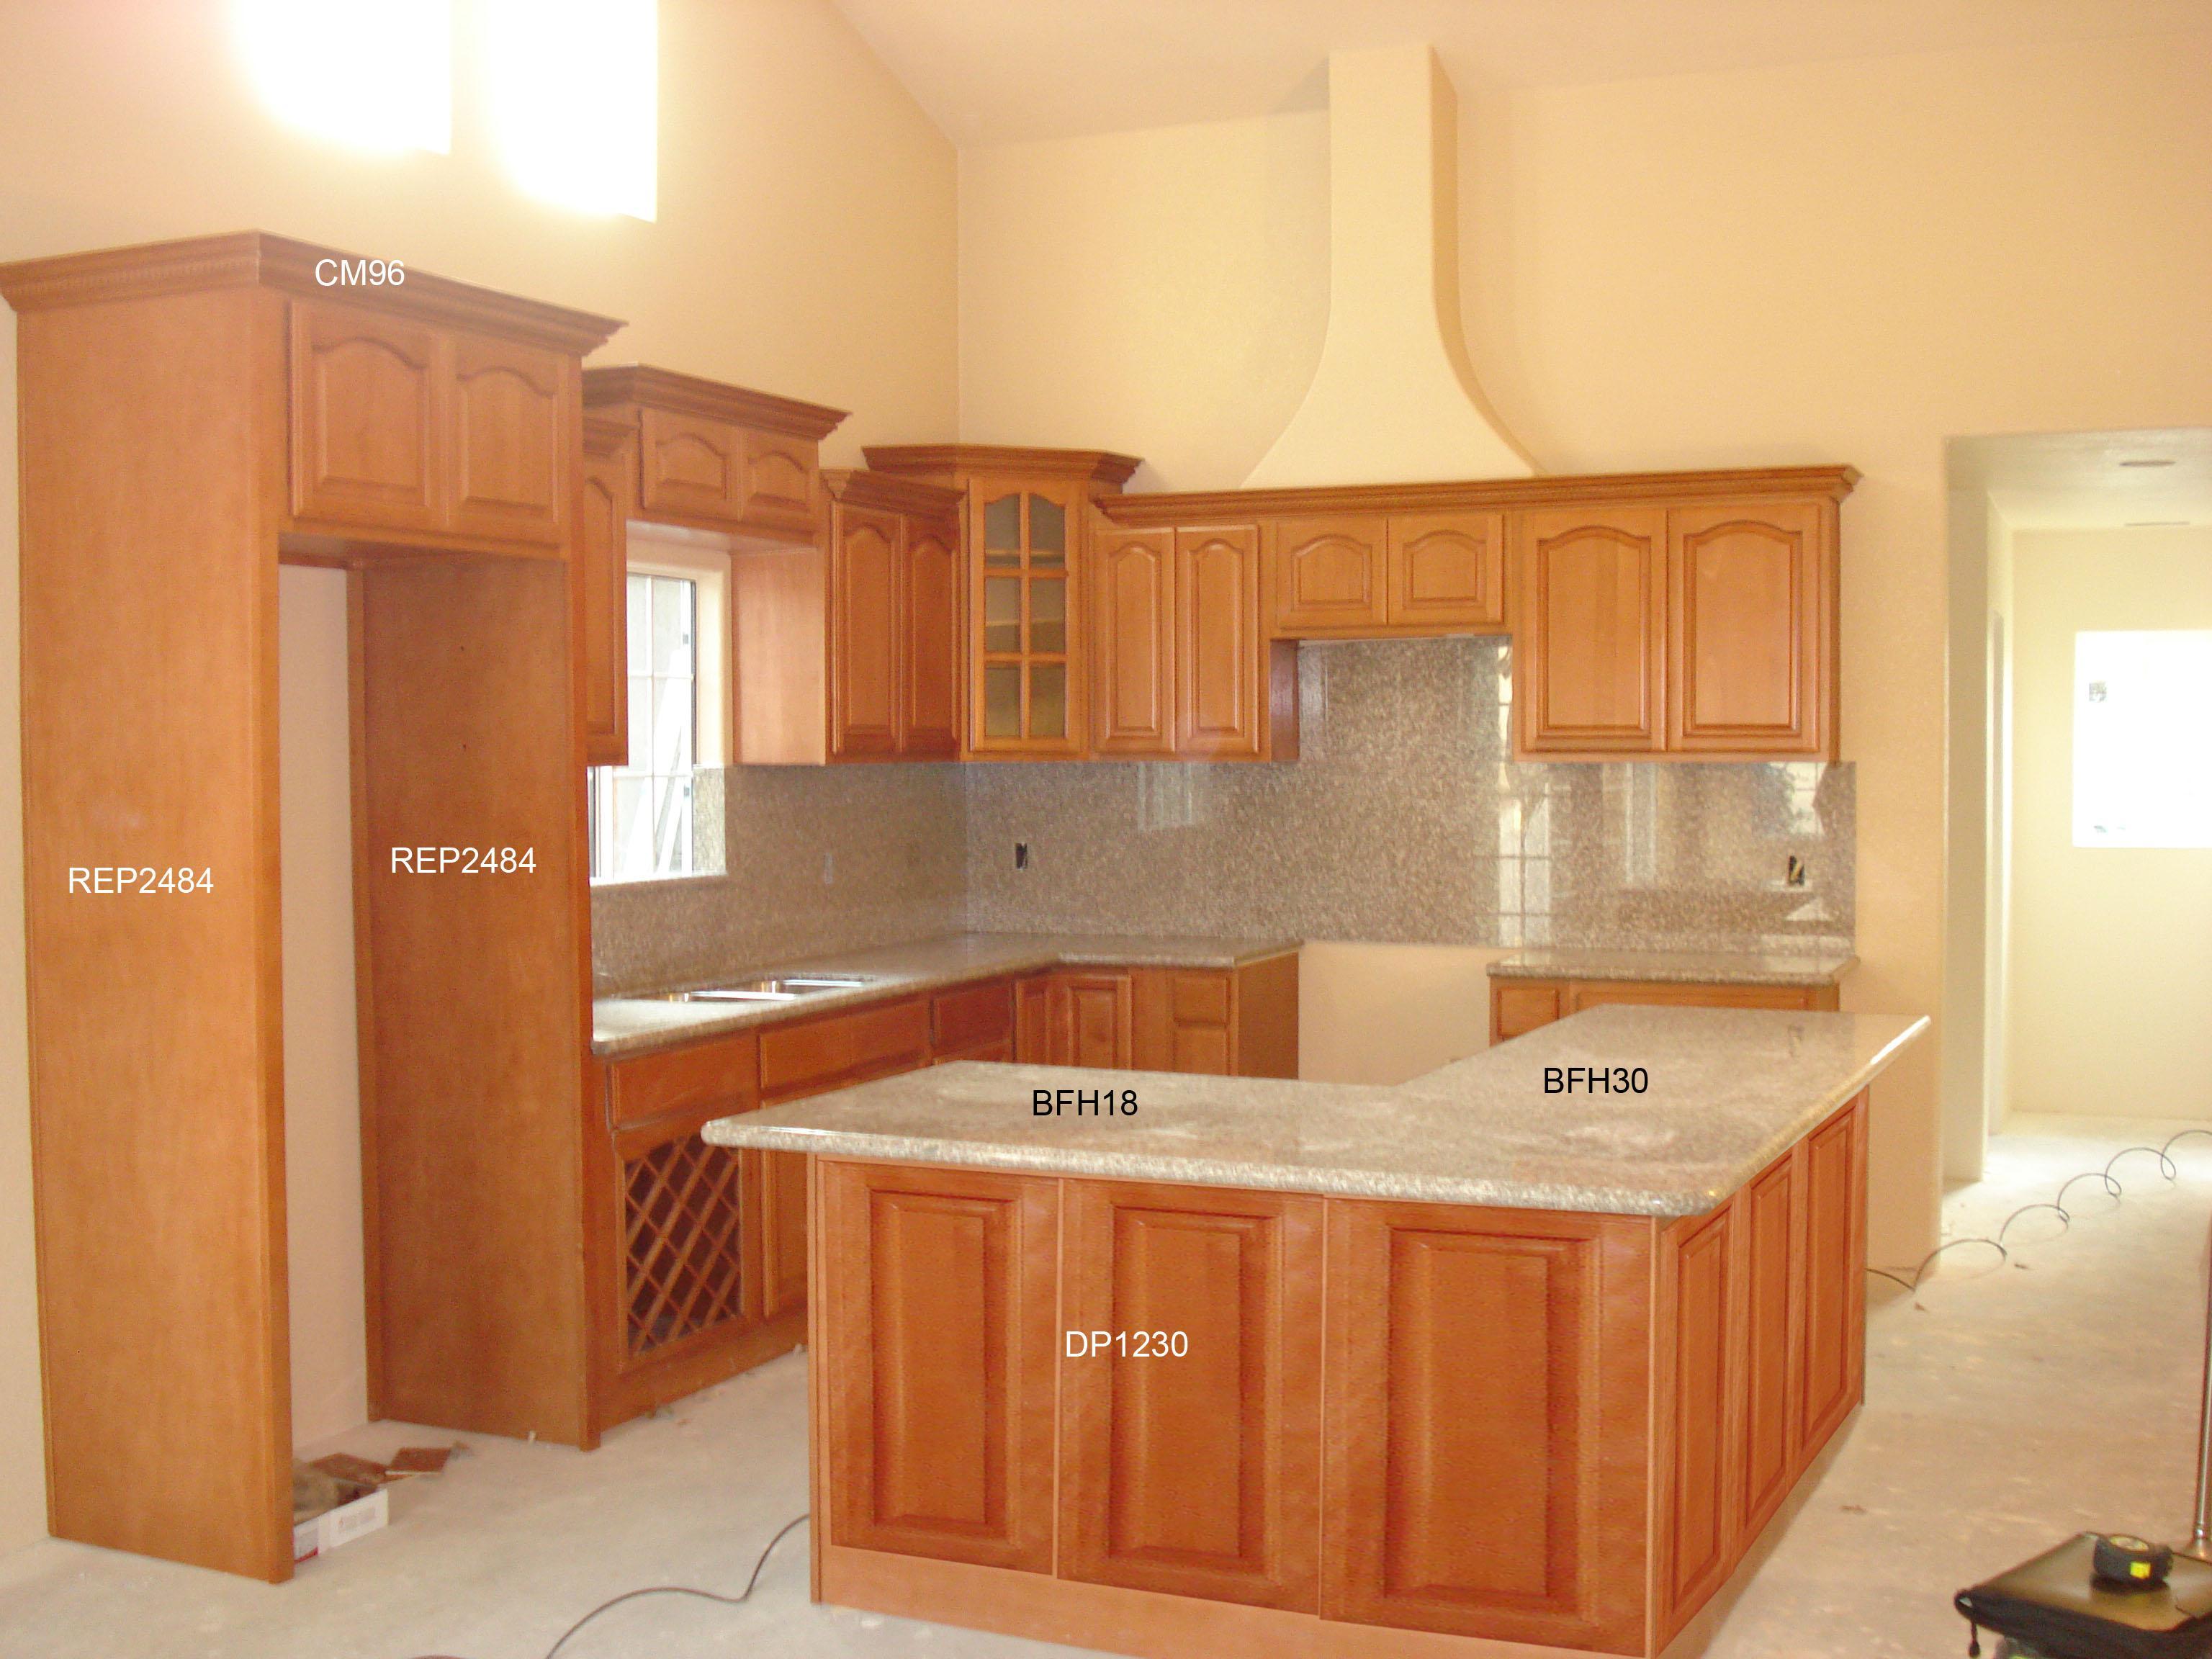 gabinetes de cocina baratos en fort myers fl